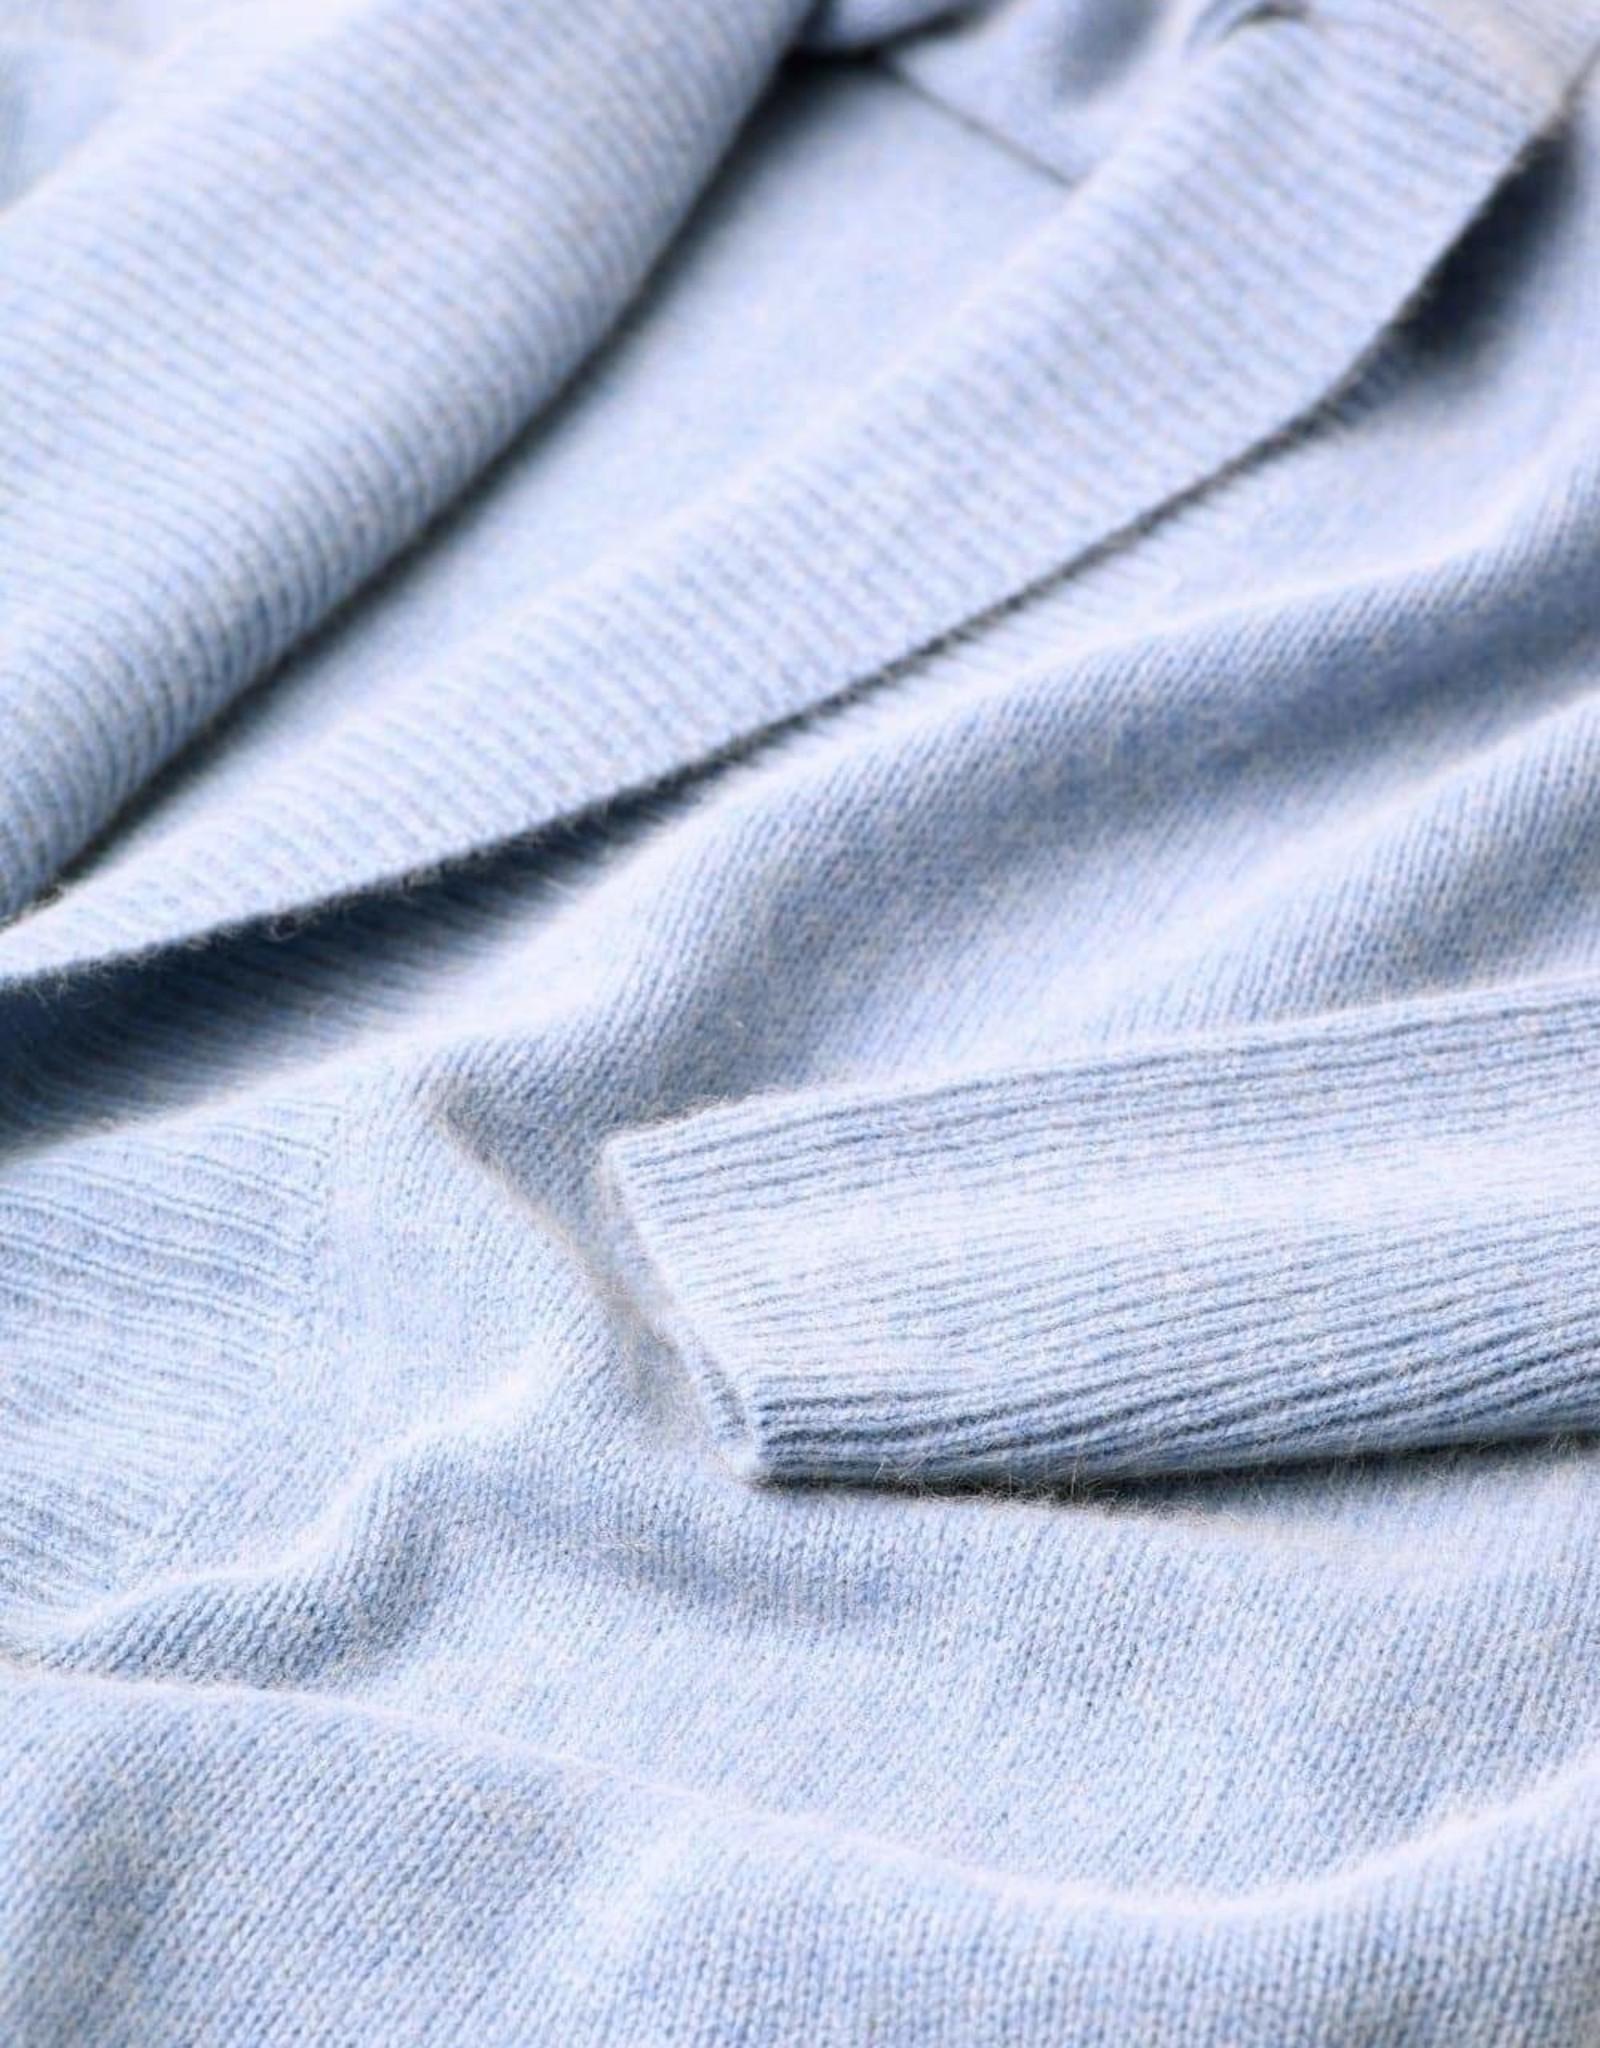 MIA FRATINO CASSIE OVERSIZED CARDI ICE BLUE